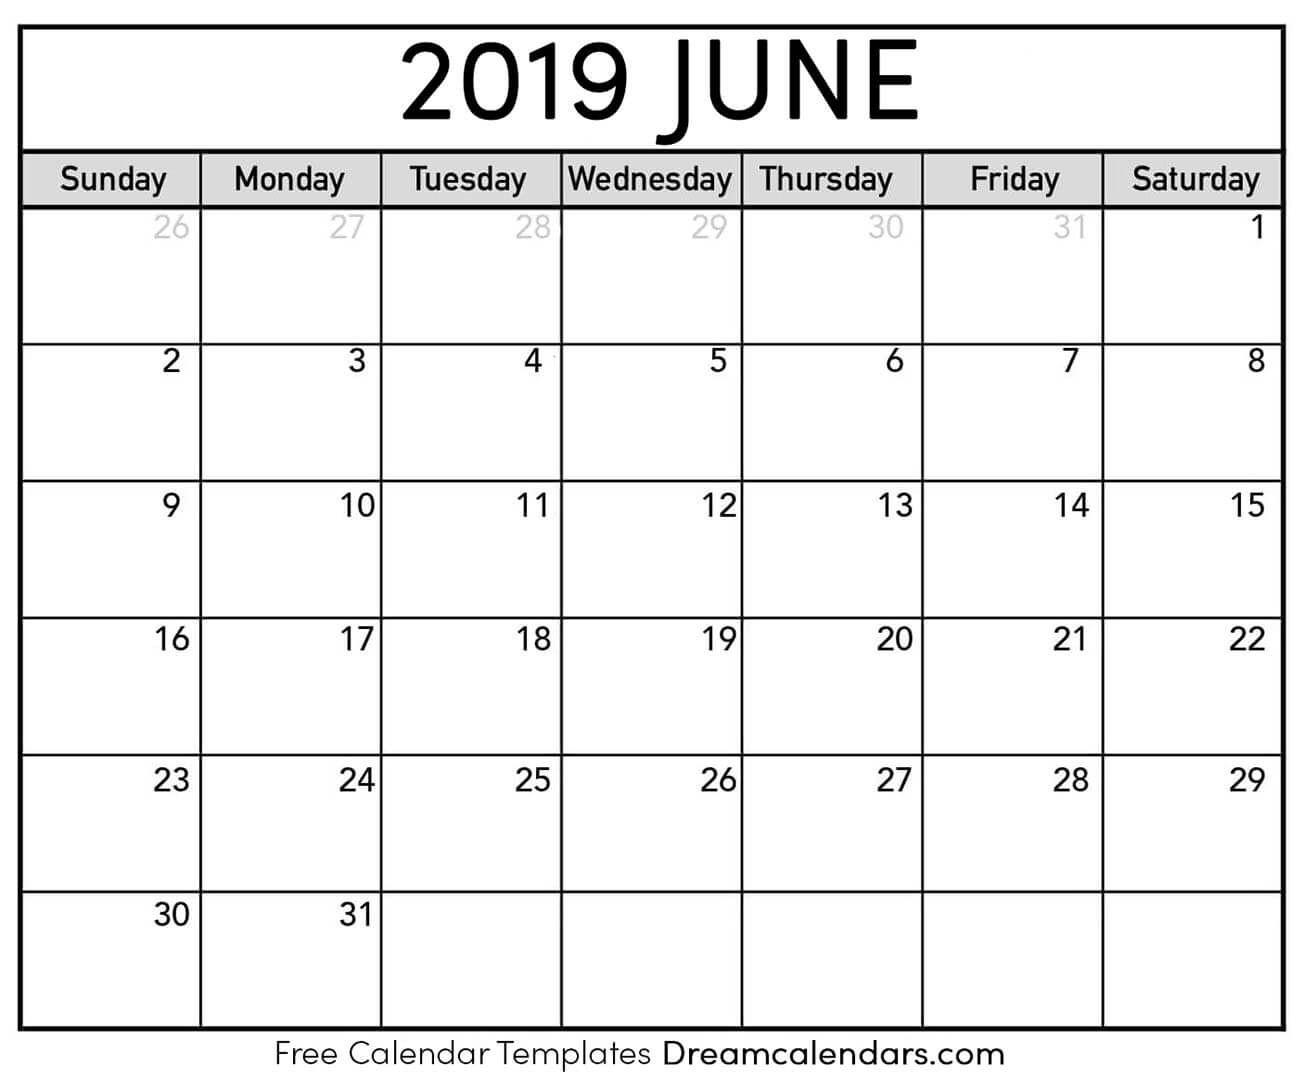 Best printable and editable June 2019 calendars  Download